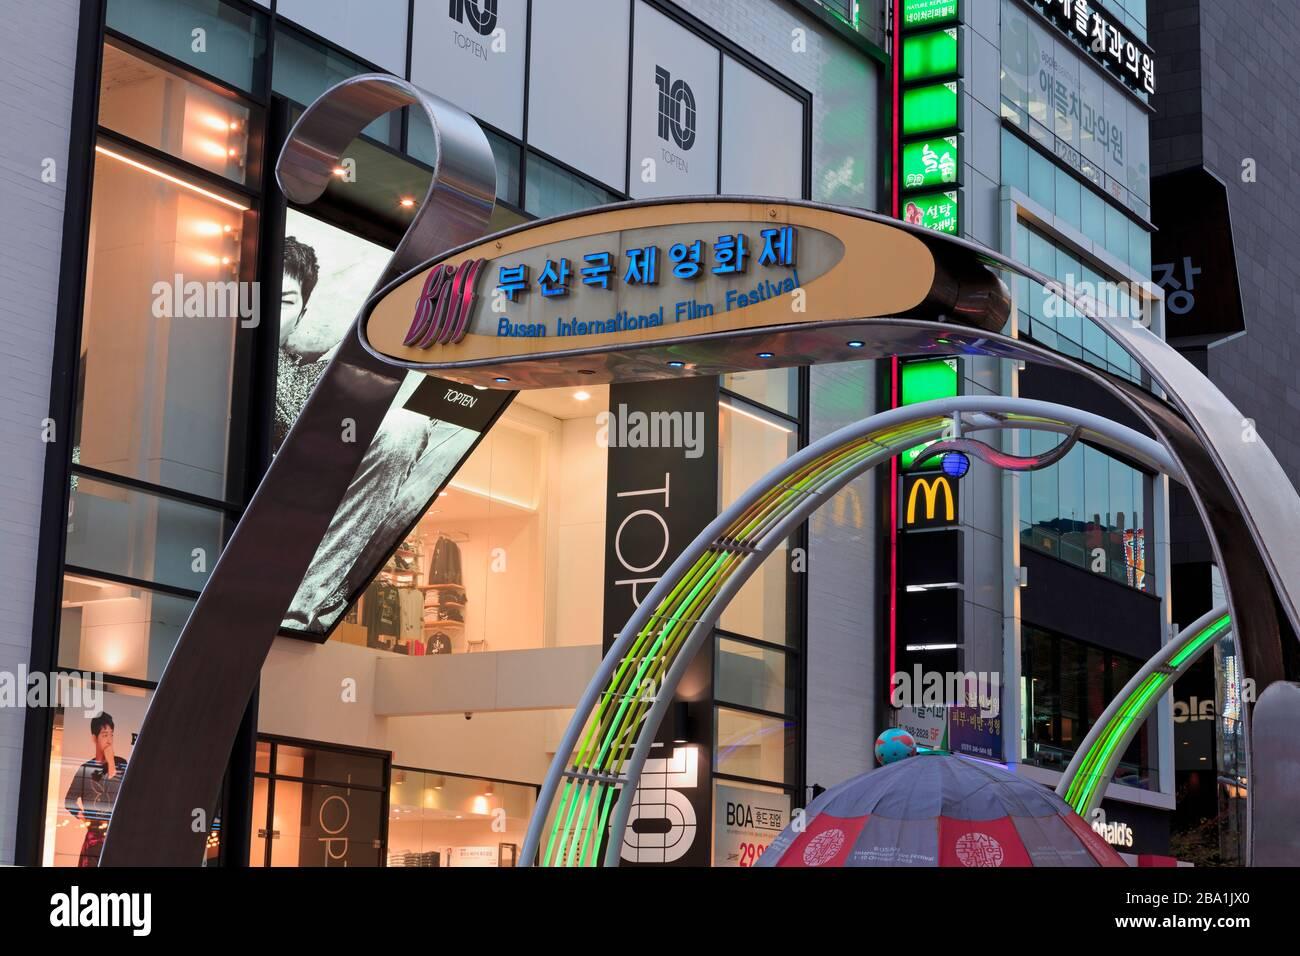 BIFF Square, el distrito de Nampo, Busan, Corea del Sur, Asia Foto de stock